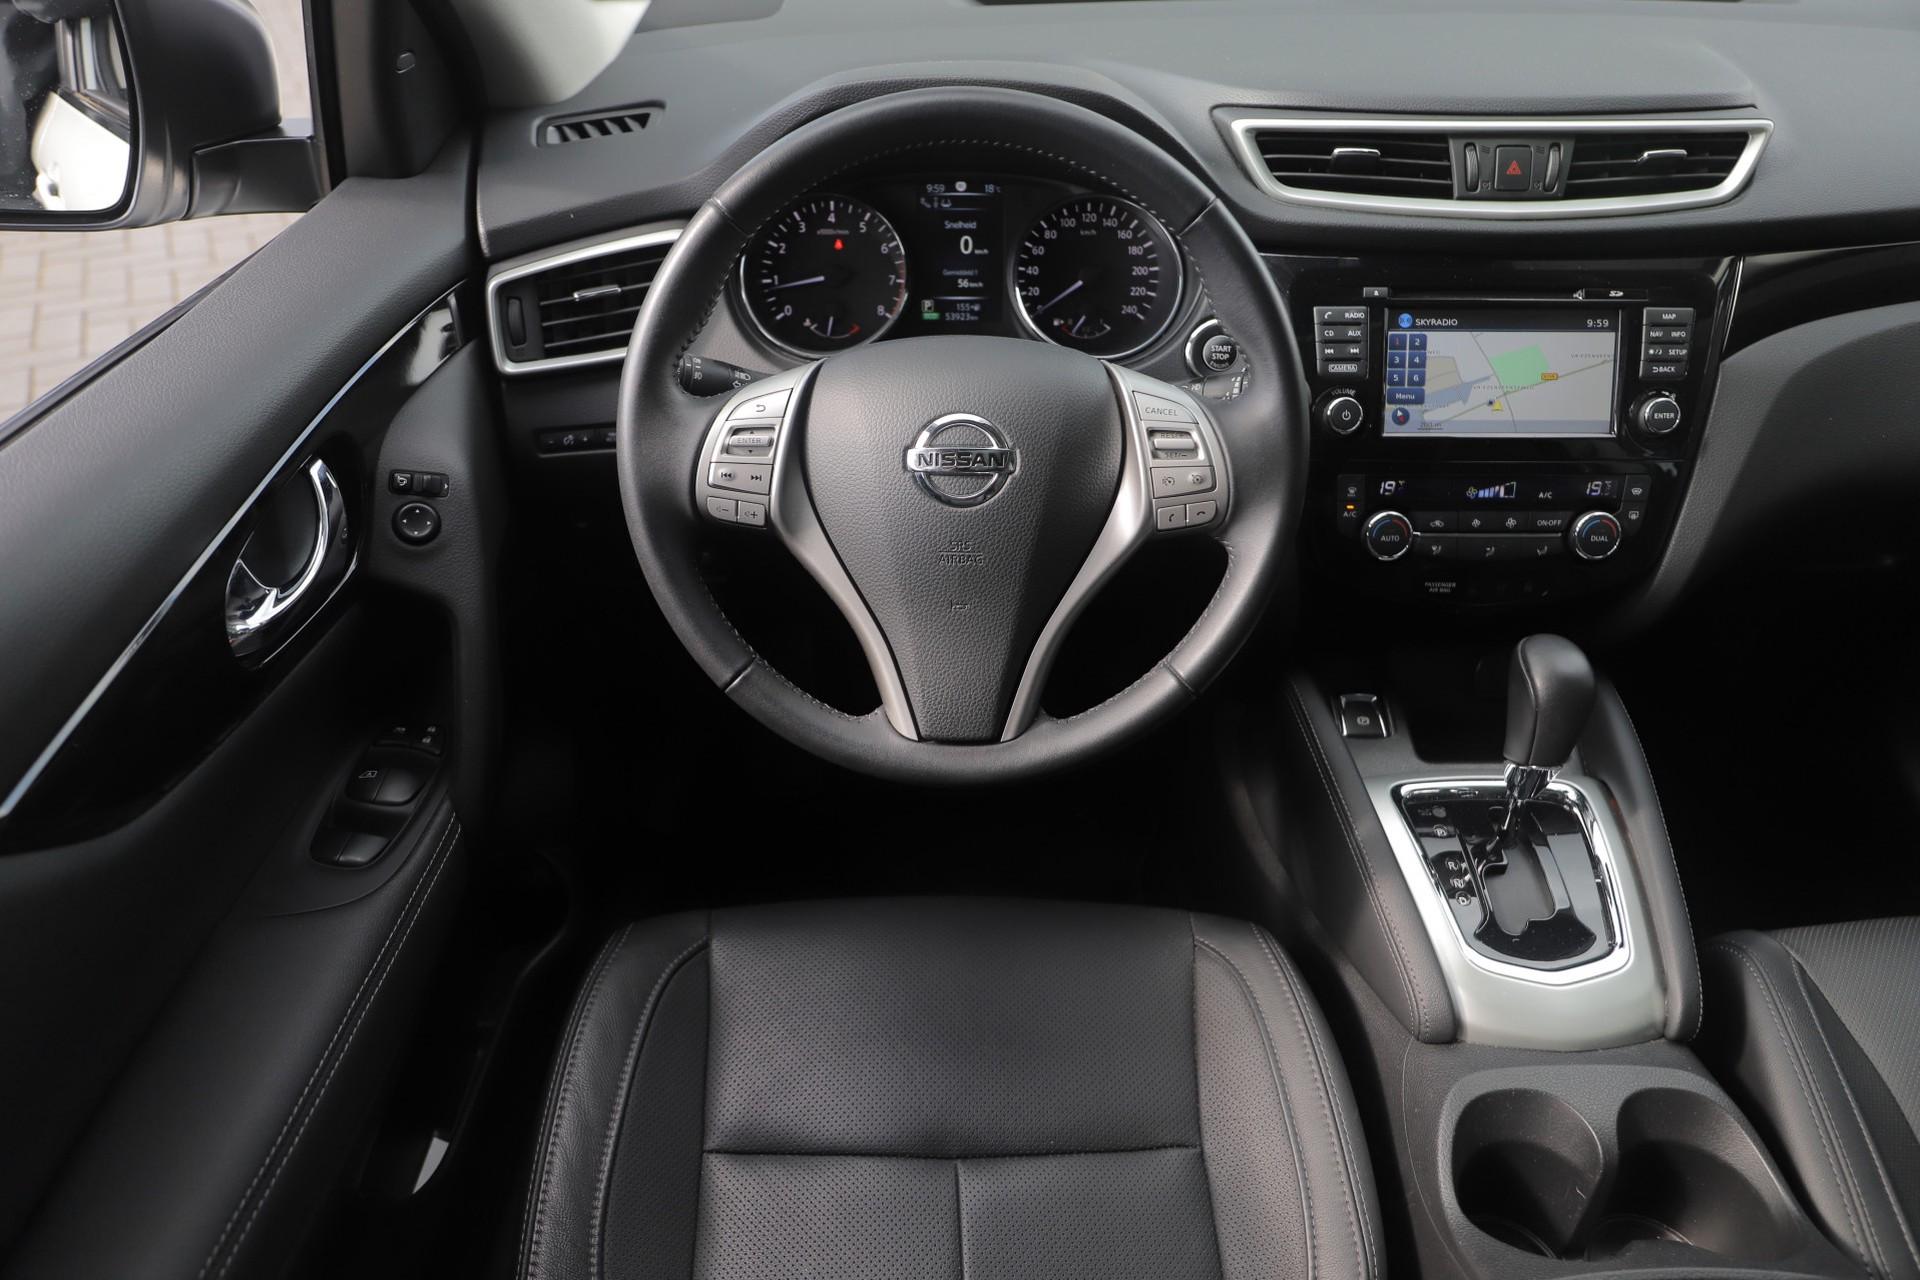 Tweedehands Nissan Qashqai 2017 occasion